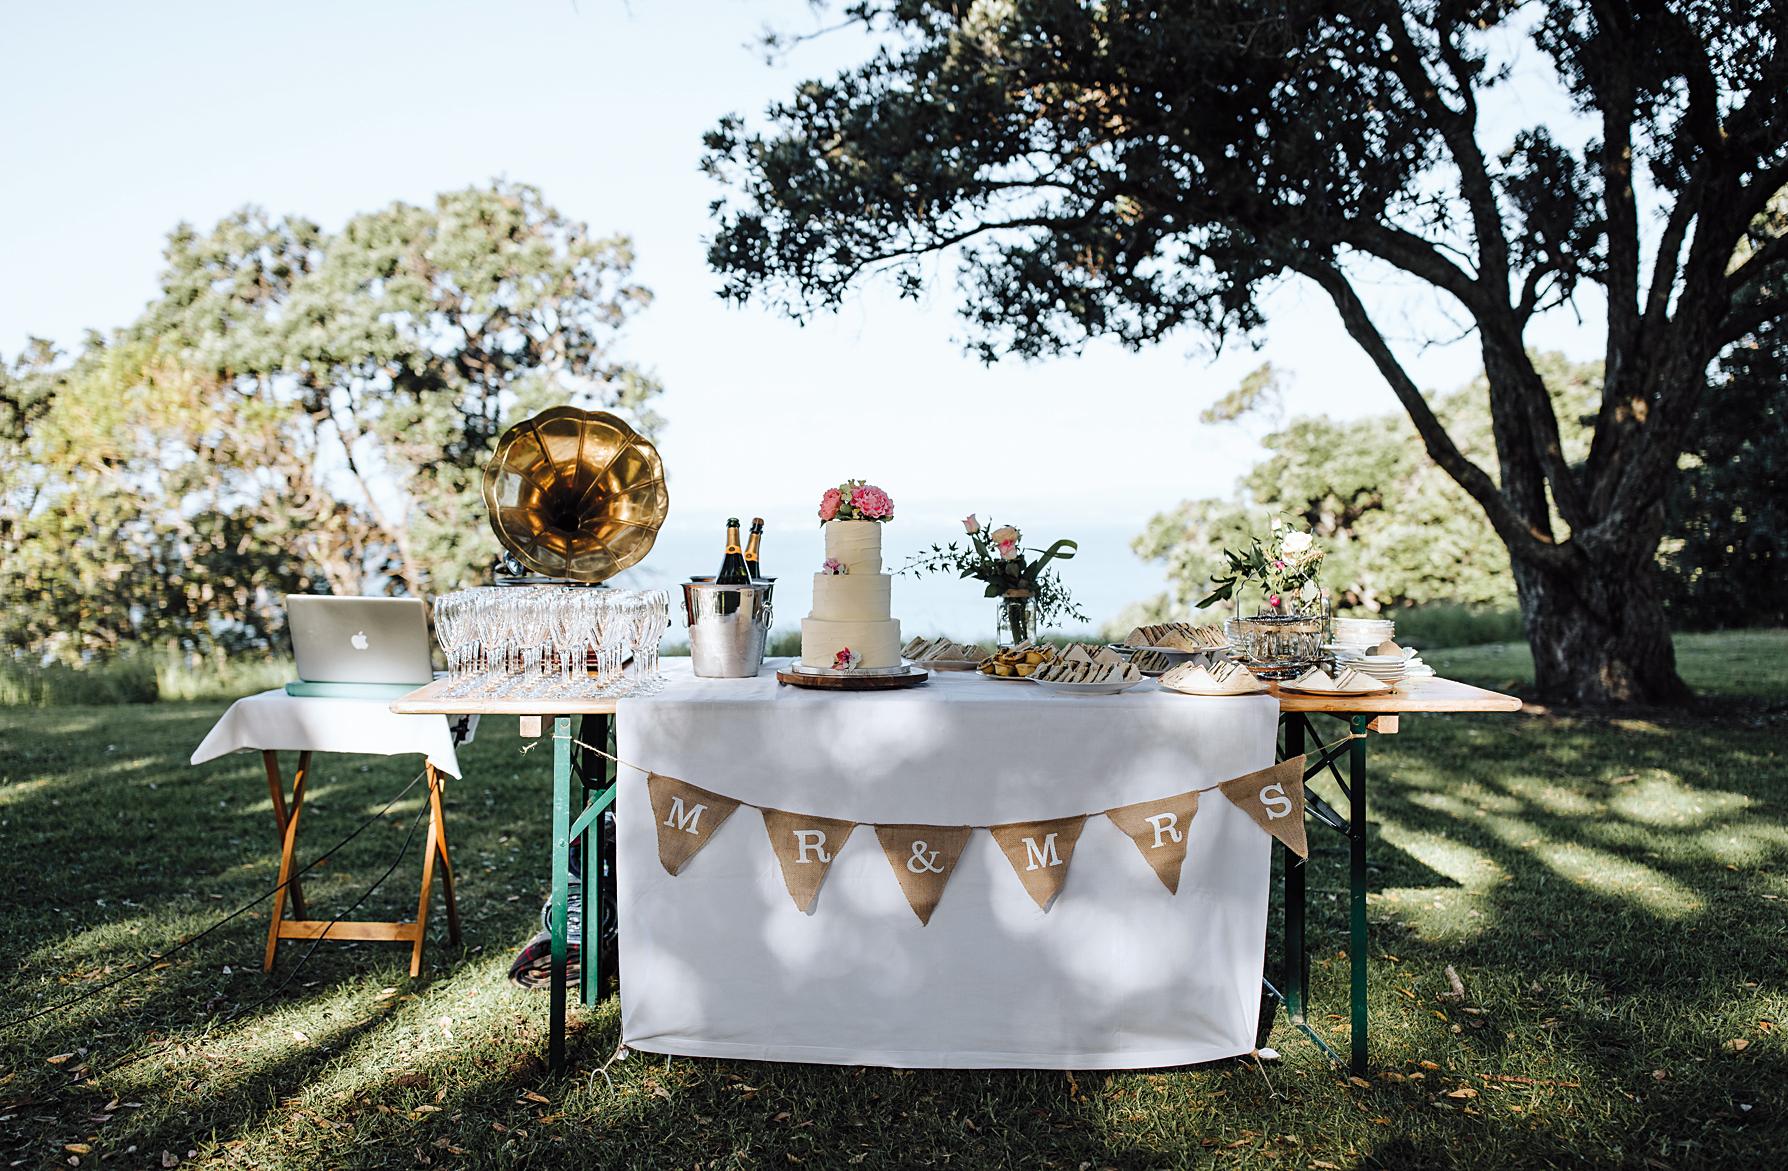 Bride & Groom Mag GROOM PARTY OF THE YEAR WINNER Luke Christiansen 12.jpg